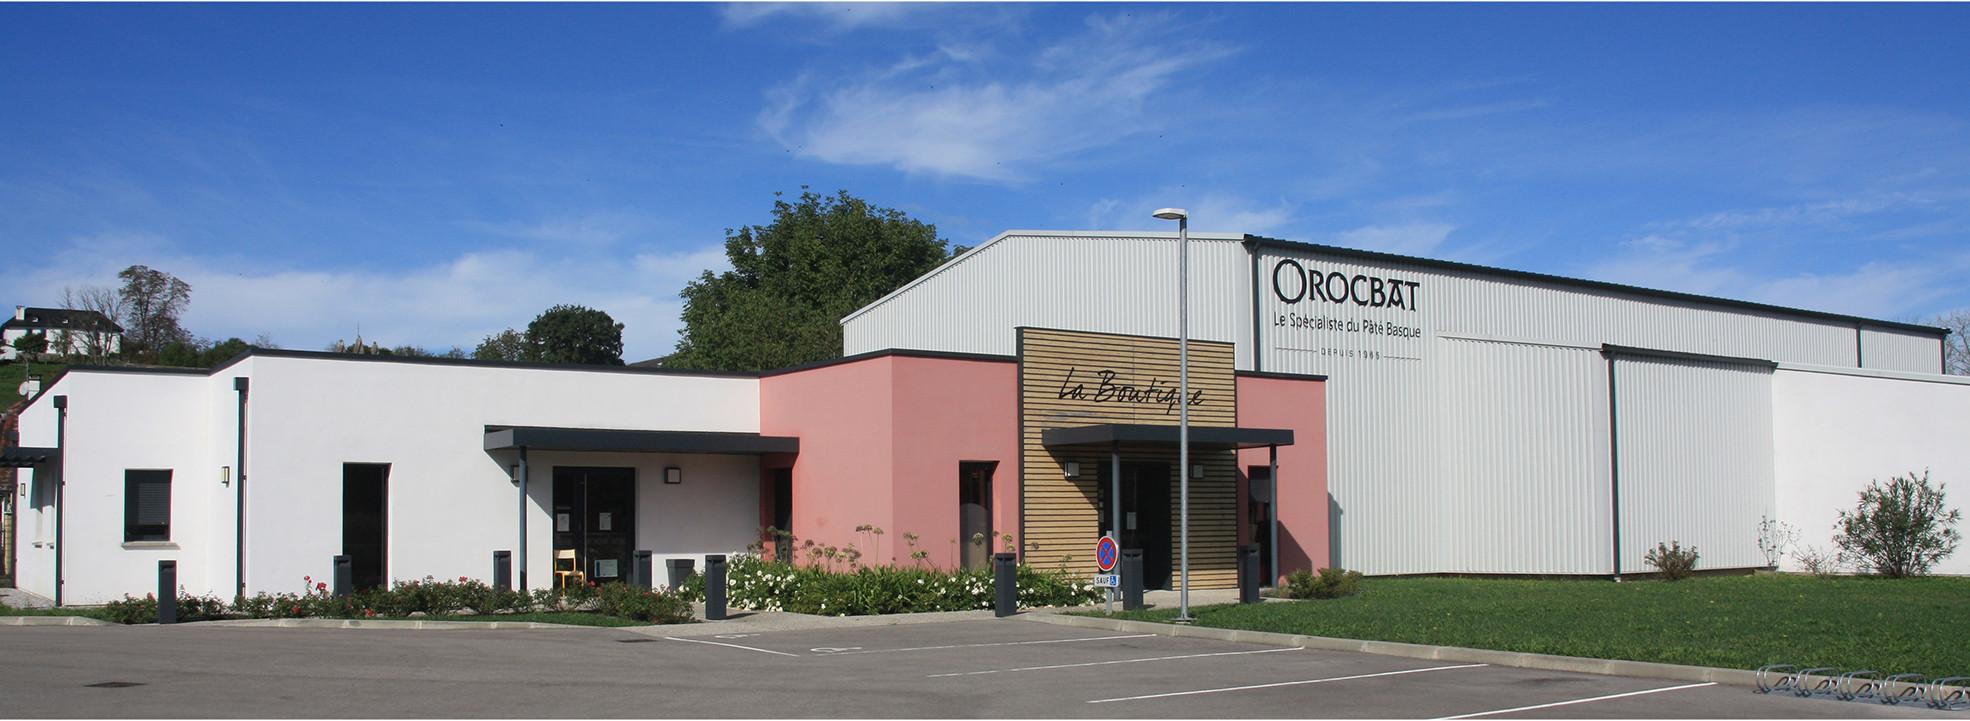 OROCBAT building and warehouse